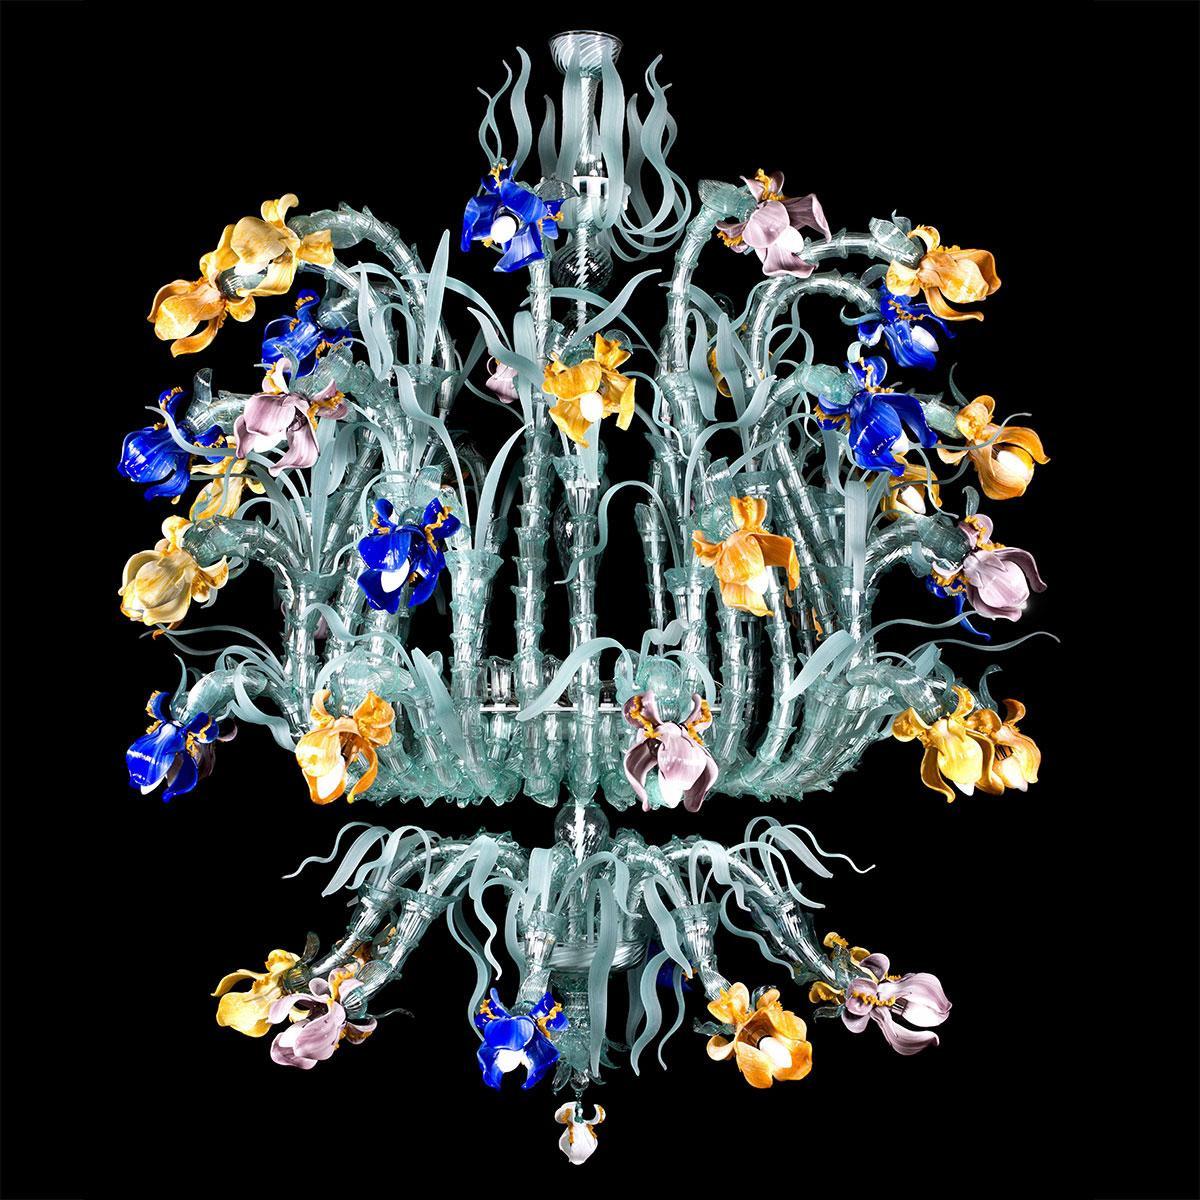 """Gemma"" Murano glass chandelier - 45 lights - multicolor"